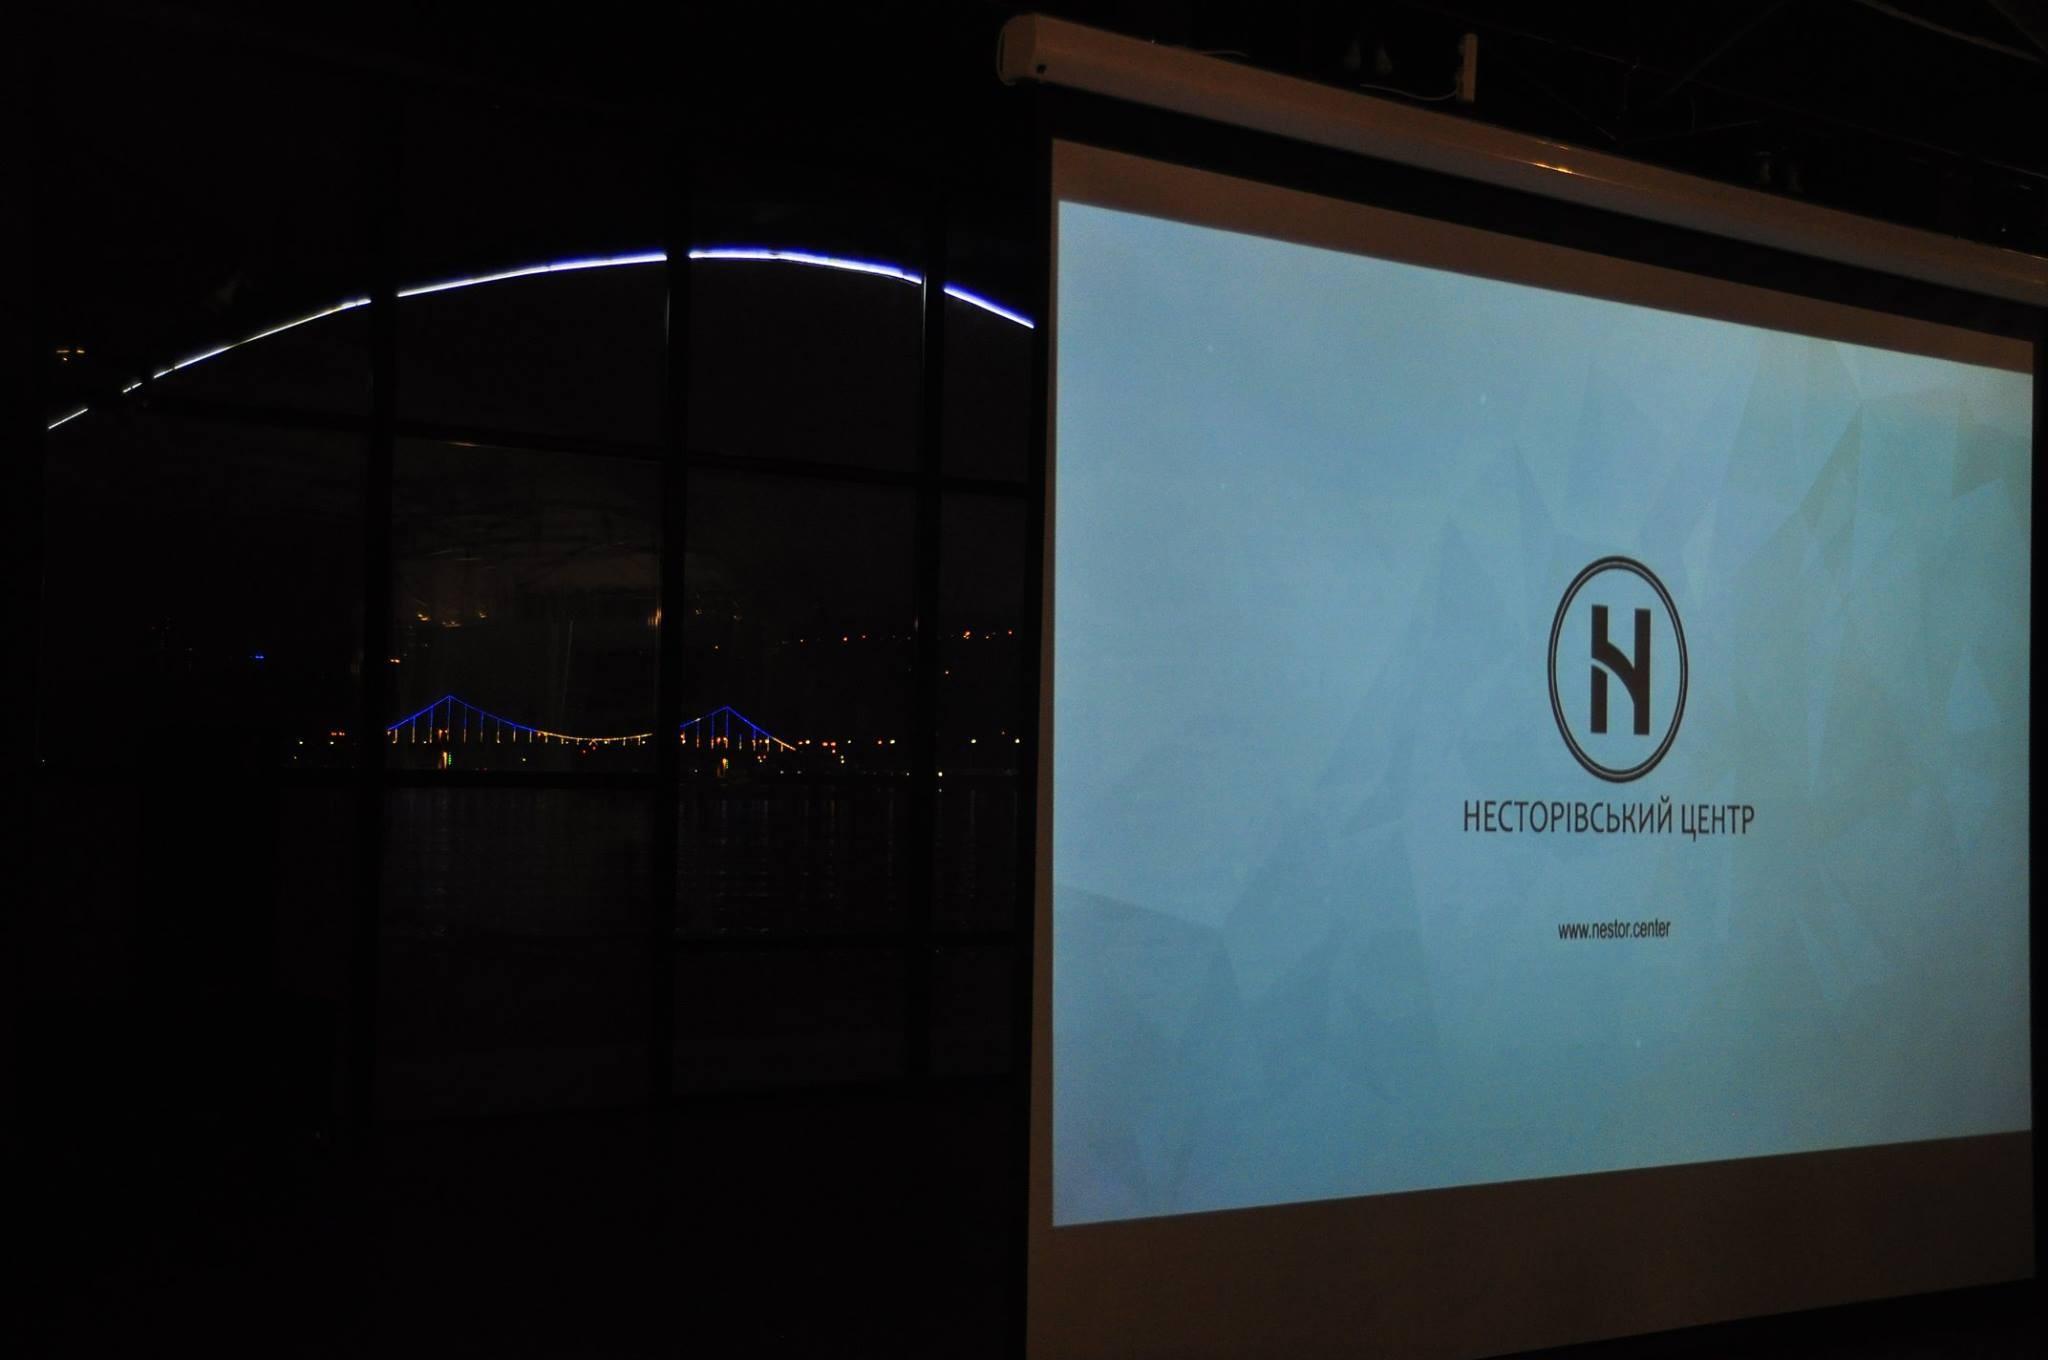 nestor-project-29.10.2018